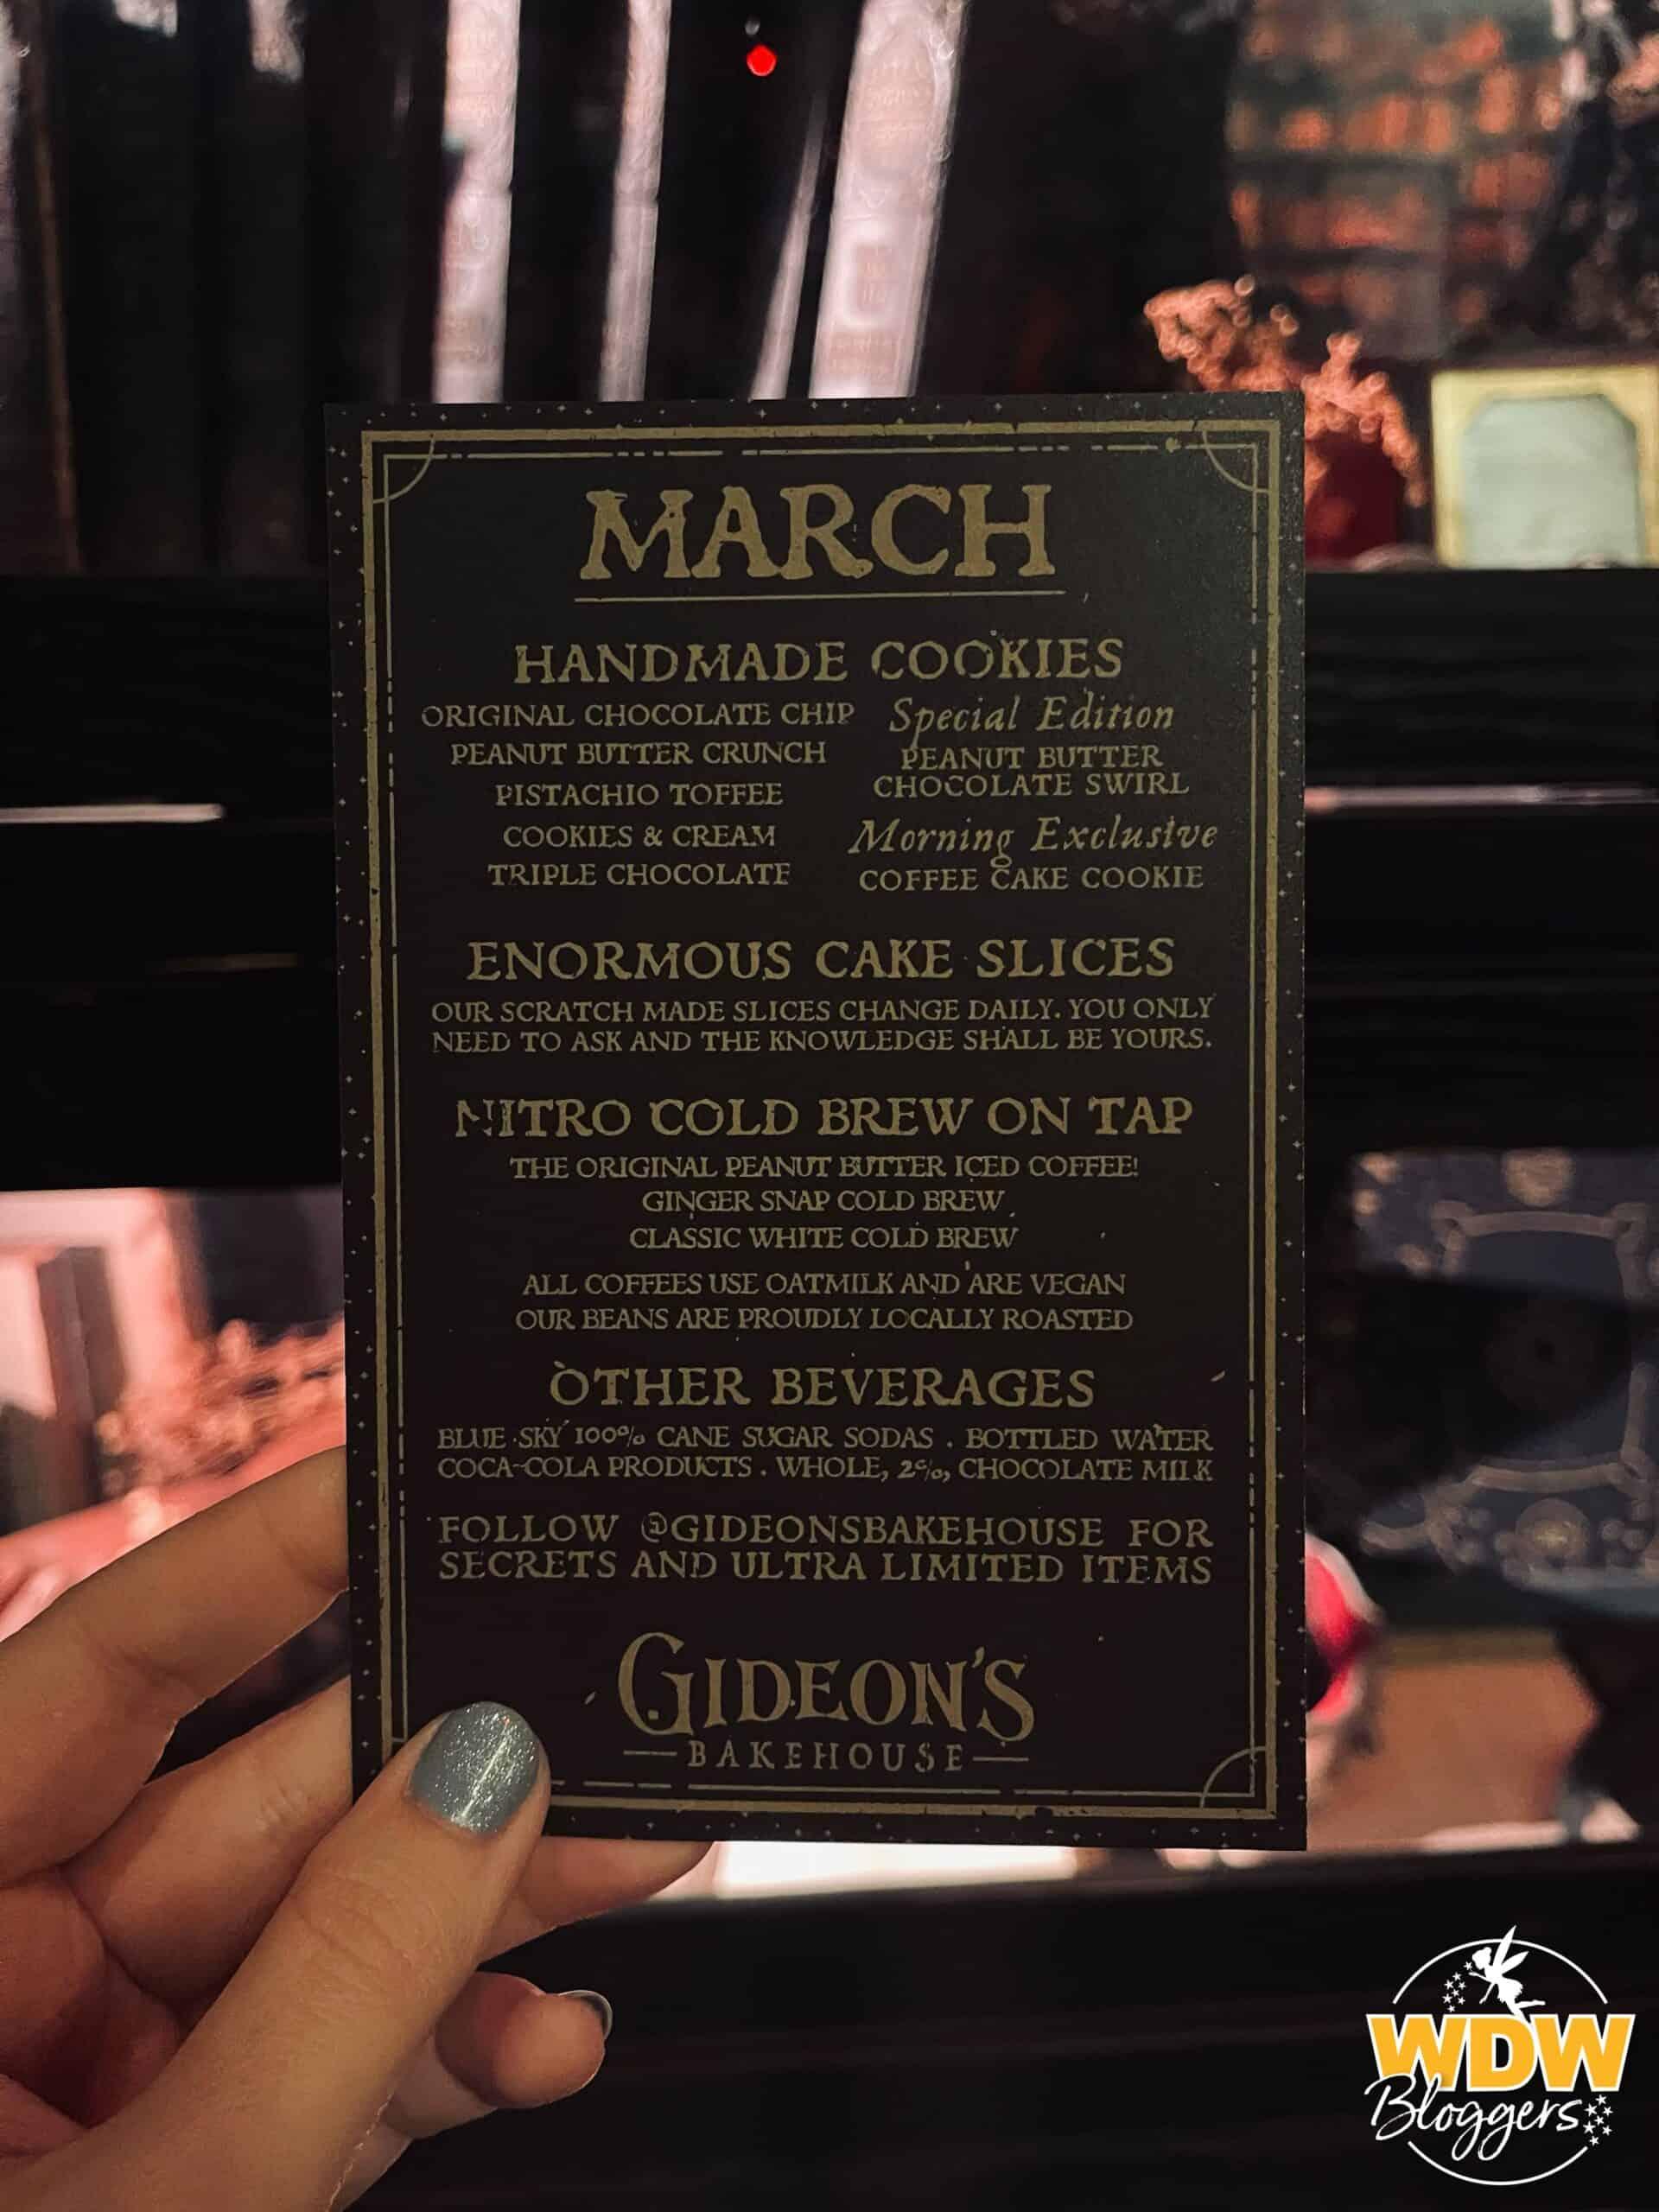 Gideons-Bakehouse-Disney-Springs-March-Menu-2